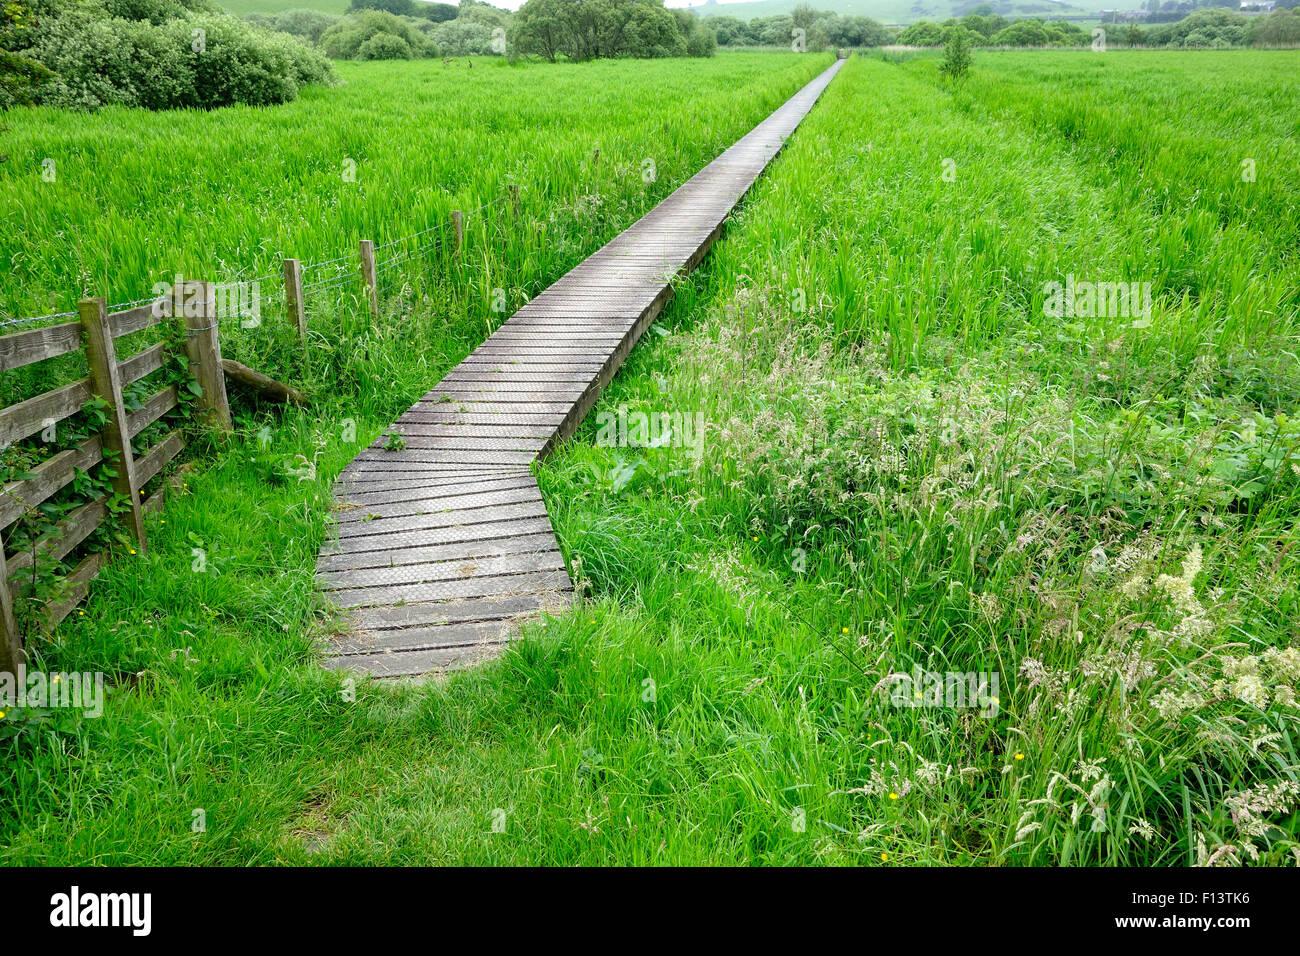 Boardwalk Through Threave & Carlingwark Loch Site of Special Scientific Interest, Castle Douglas, Dumfries & - Stock Image